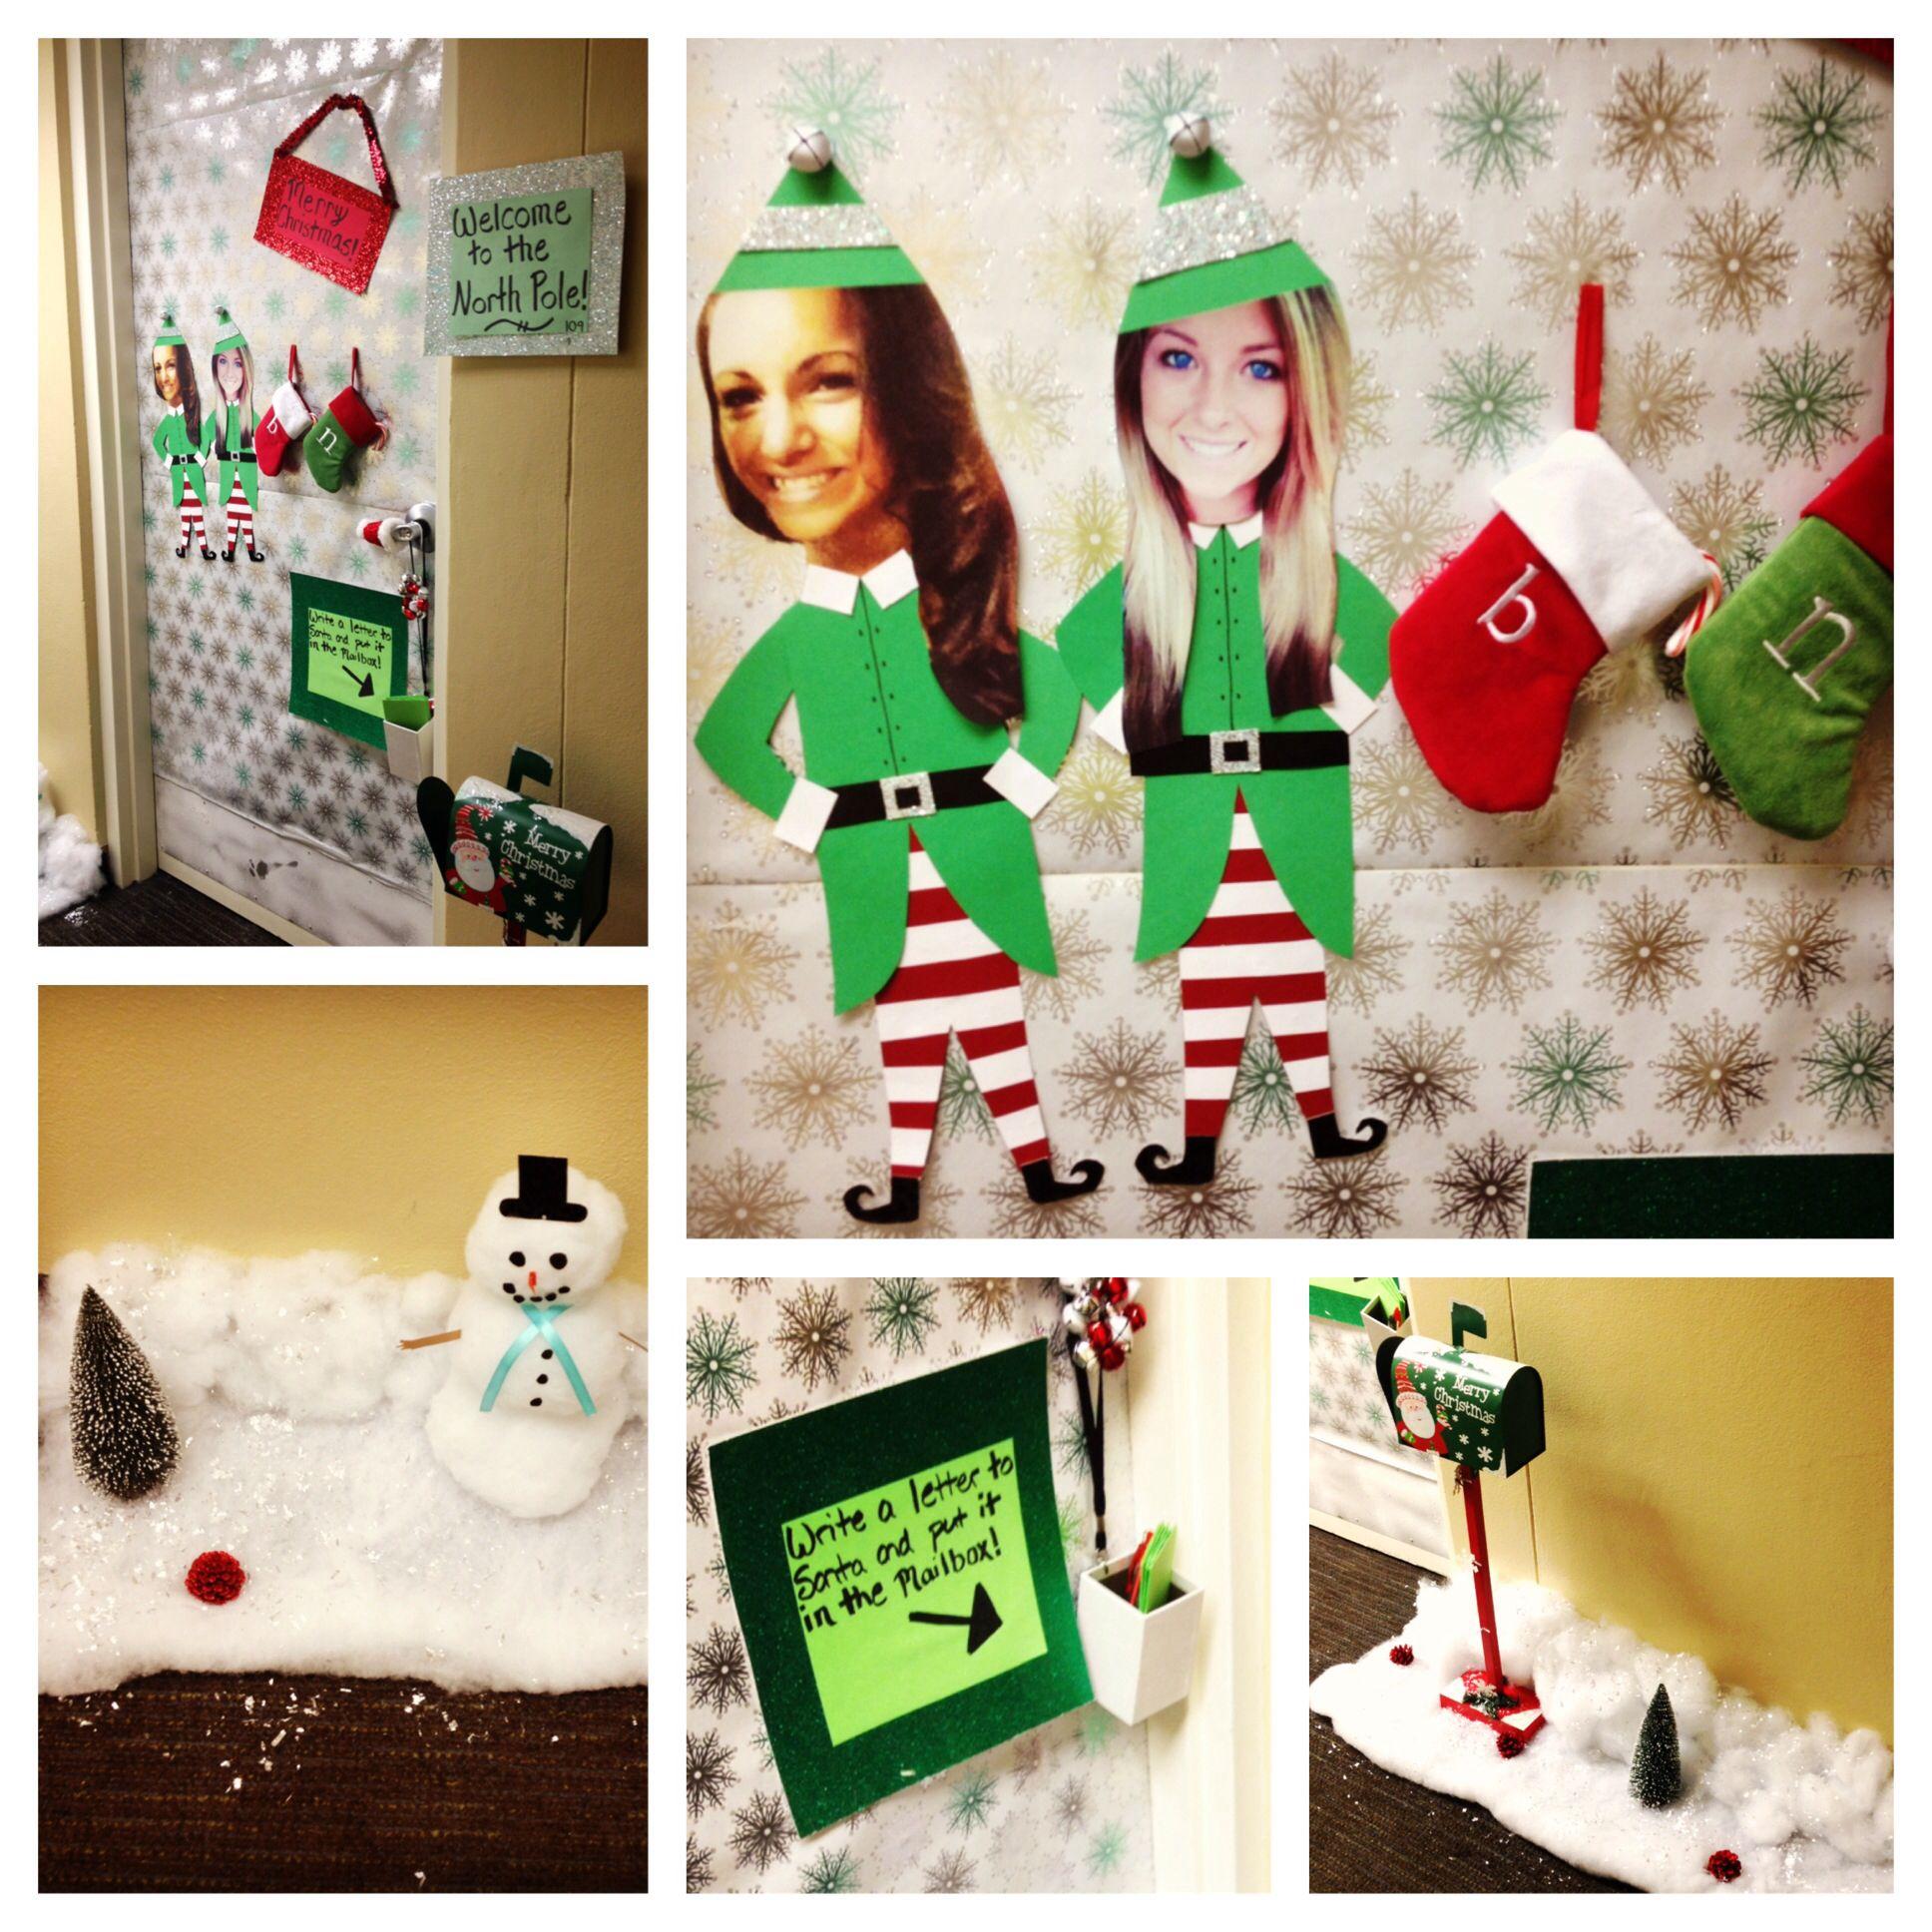 How to make a christmas elf decoration - Cute And Creative Christmas Decor